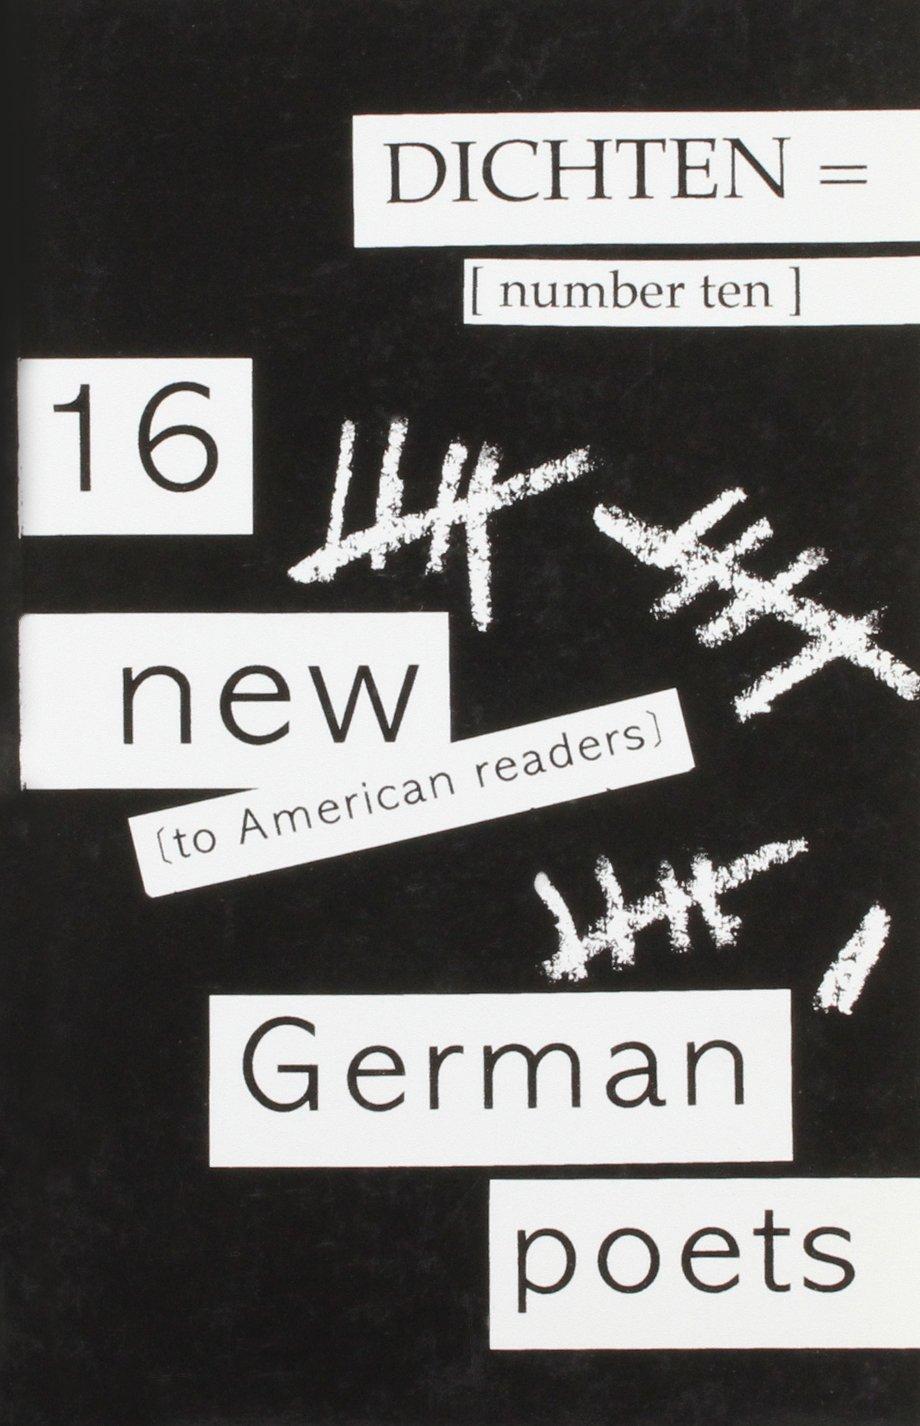 Dichten = No. 10: 16 New (To American Readers) German Poets PDF